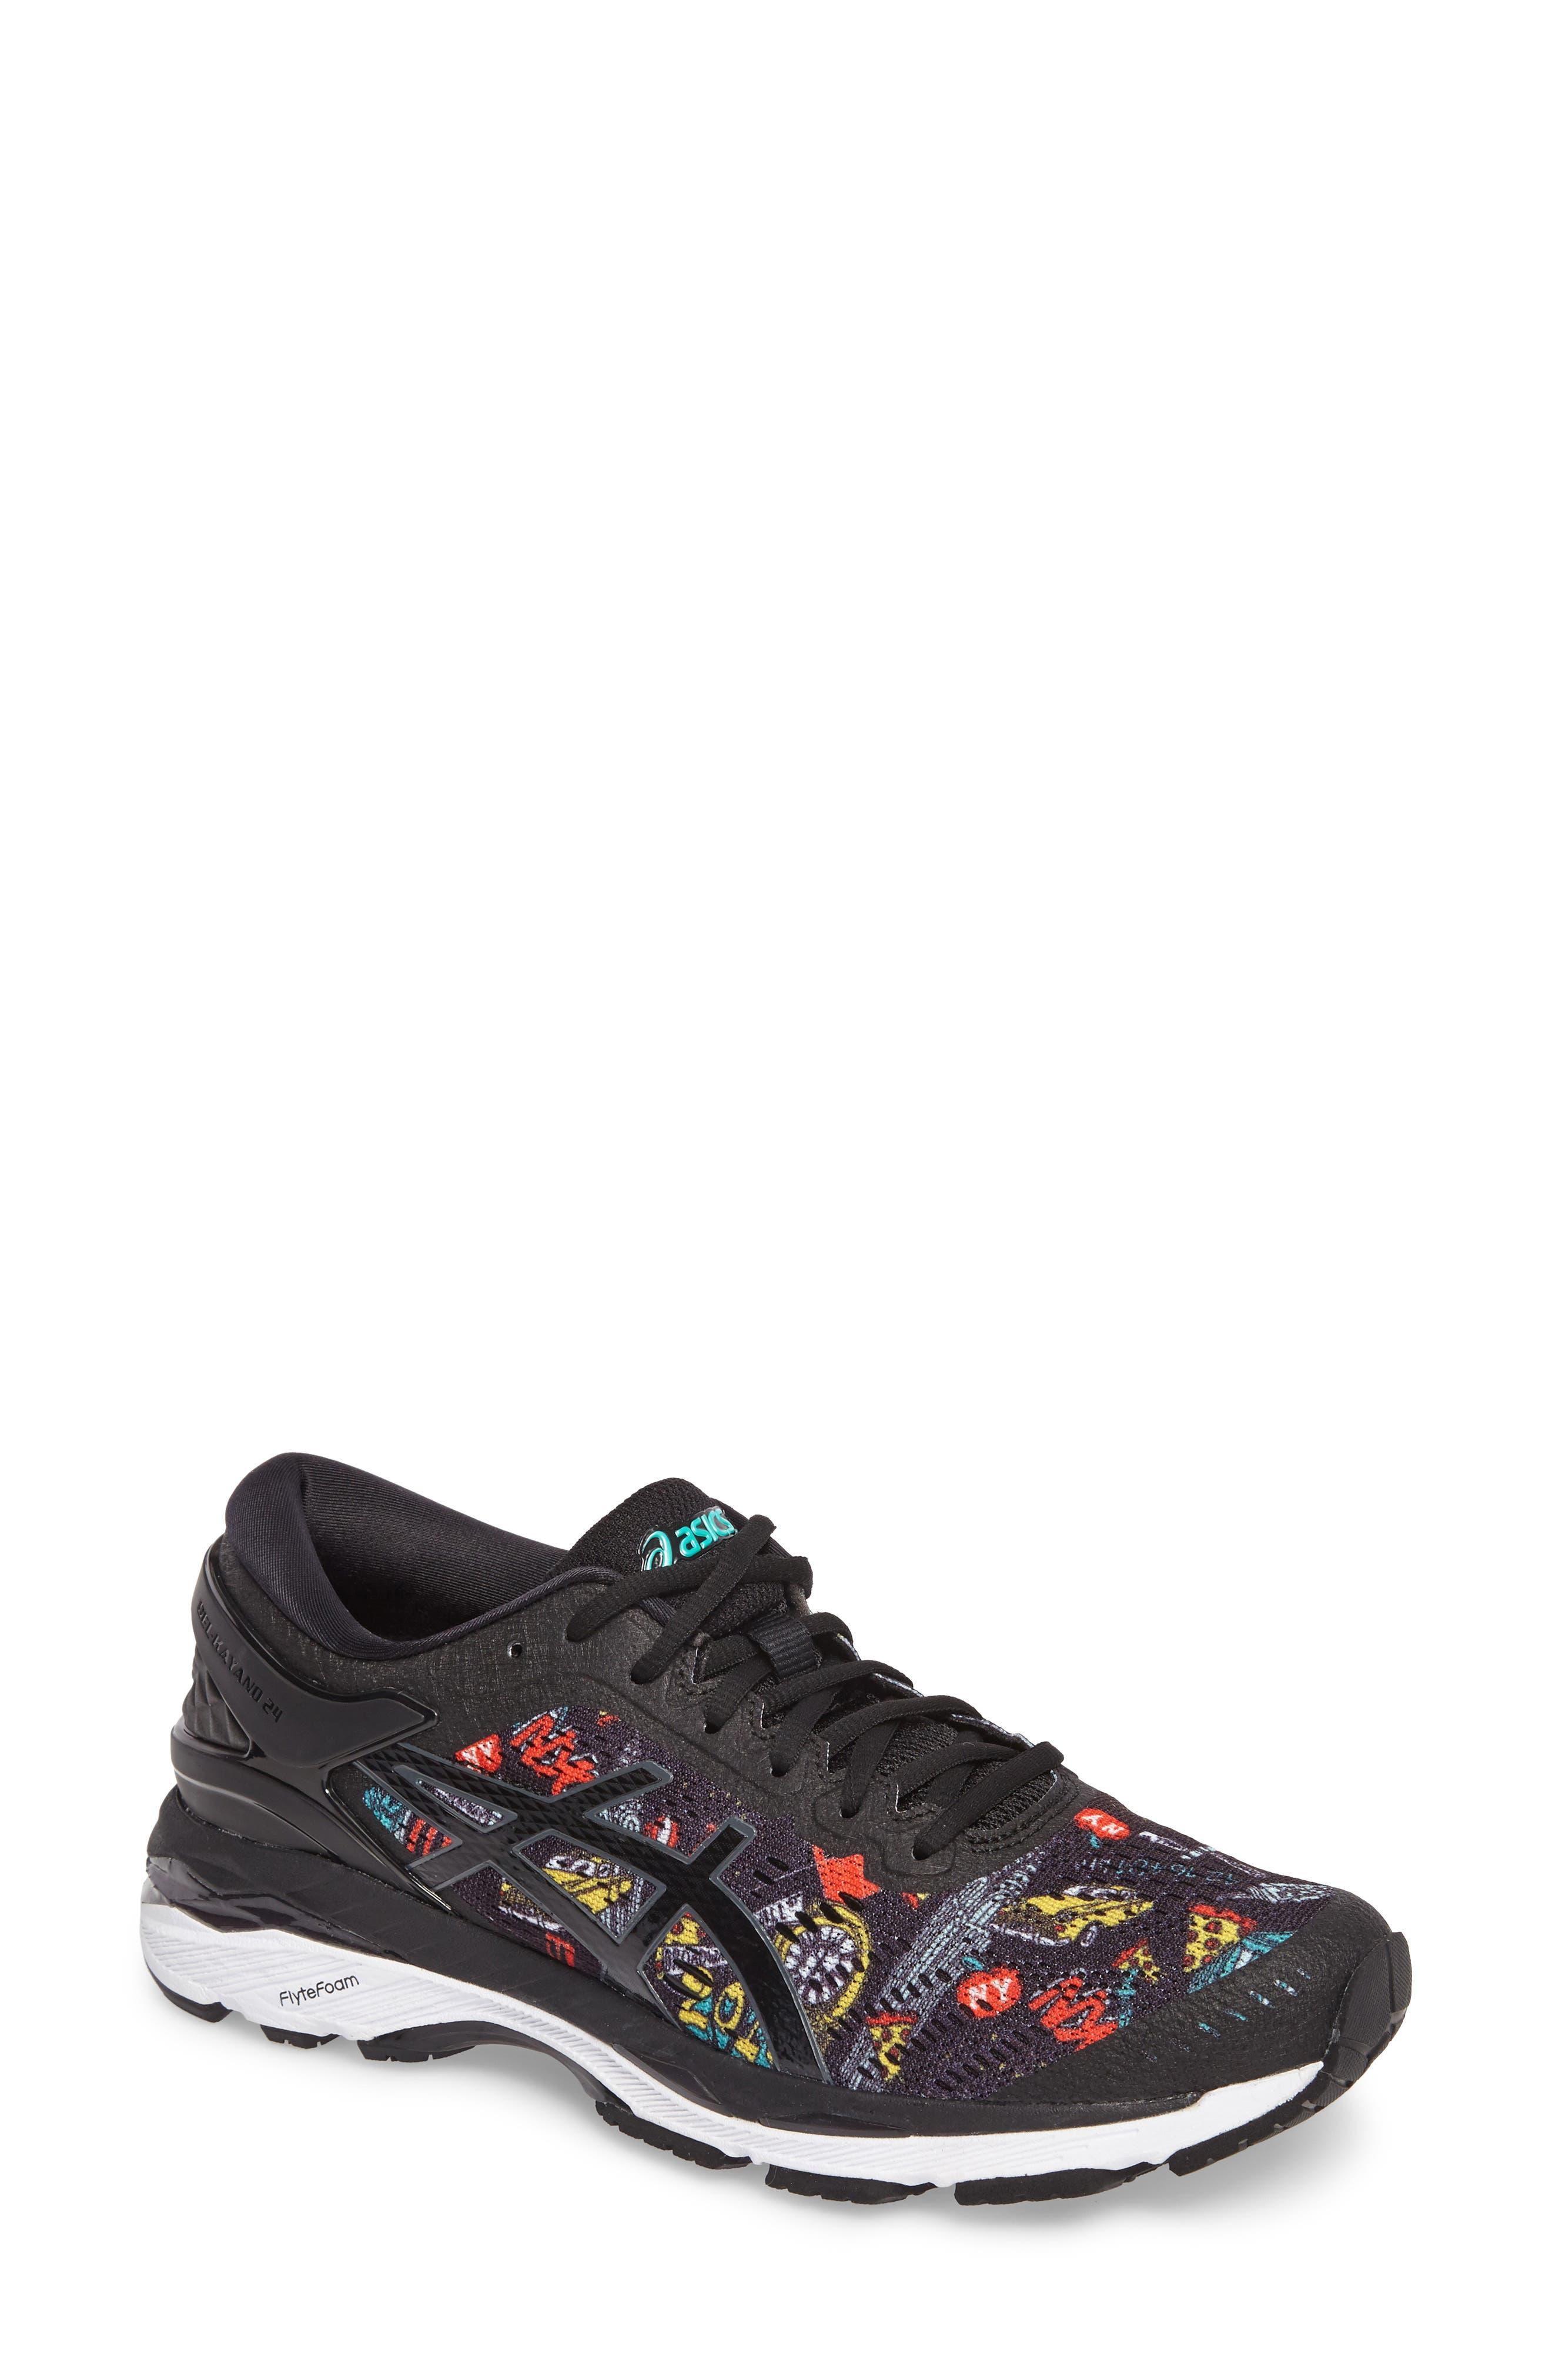 GEL-Kayano<sup>®</sup> 24 Running Shoe,                             Main thumbnail 1, color,                             009